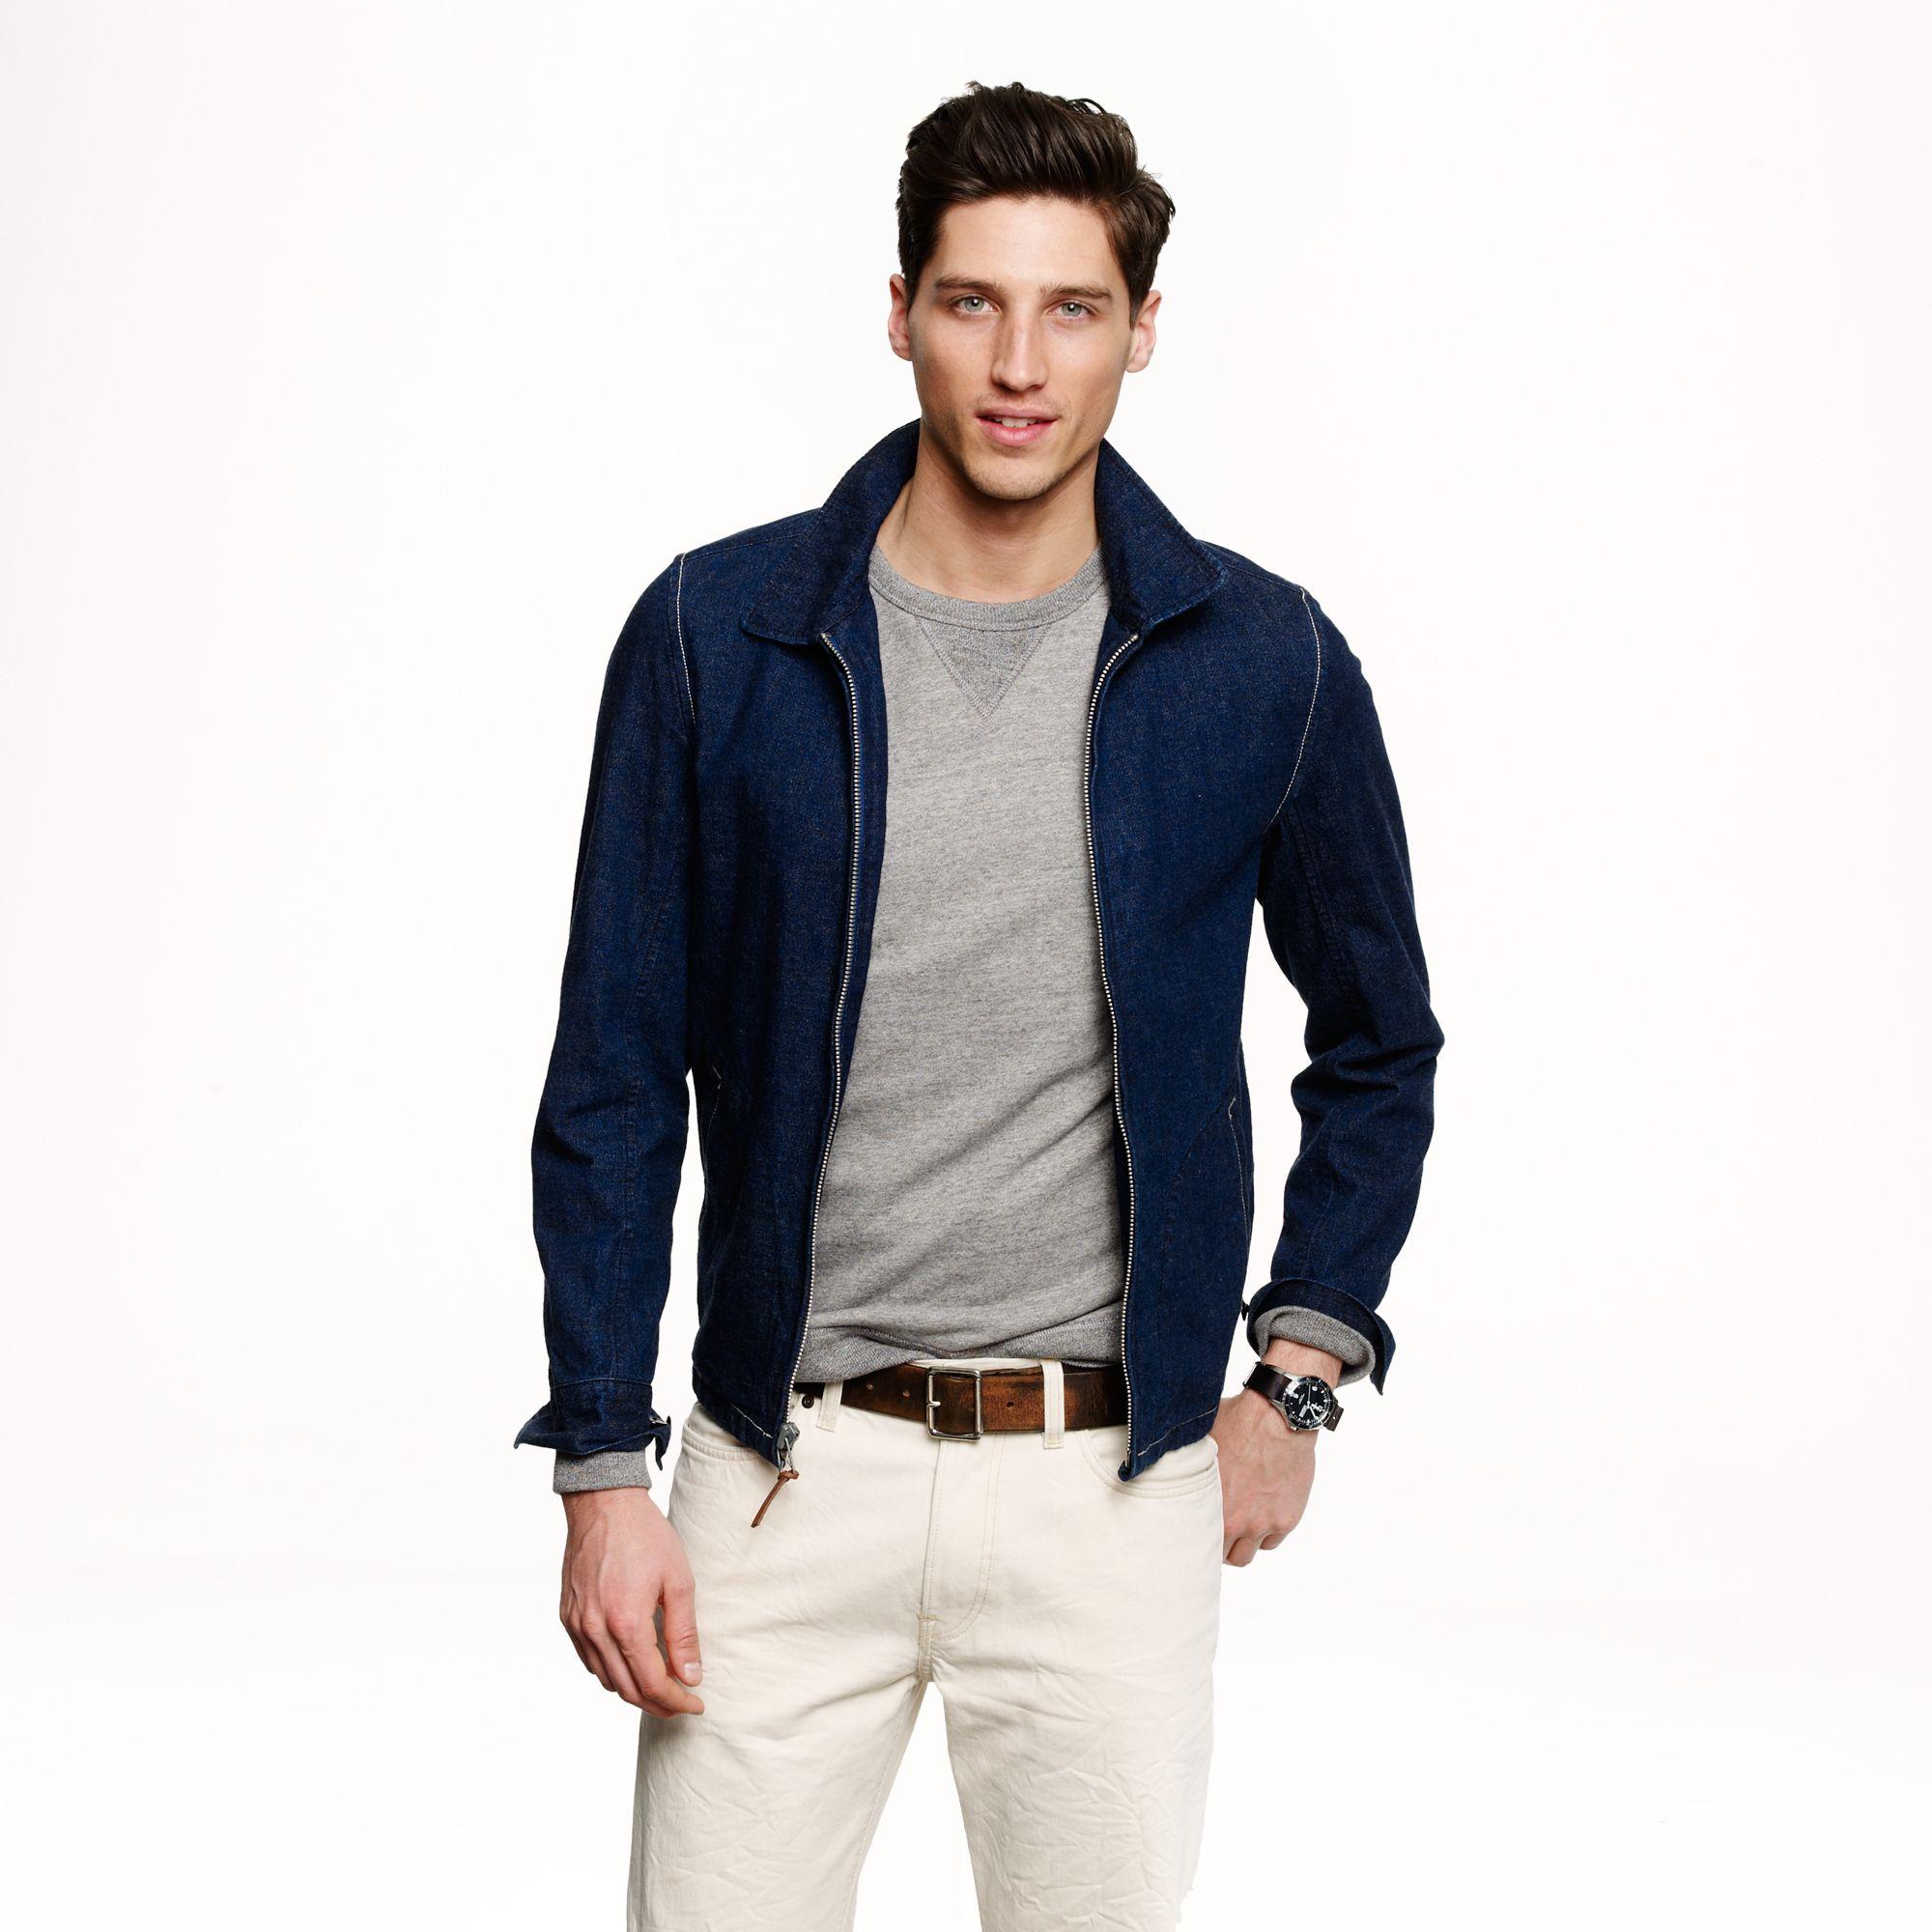 J.Crew Wallace Barnes Indigo Deck Jacket in Japanese Selvedge Denim in Blue for Men